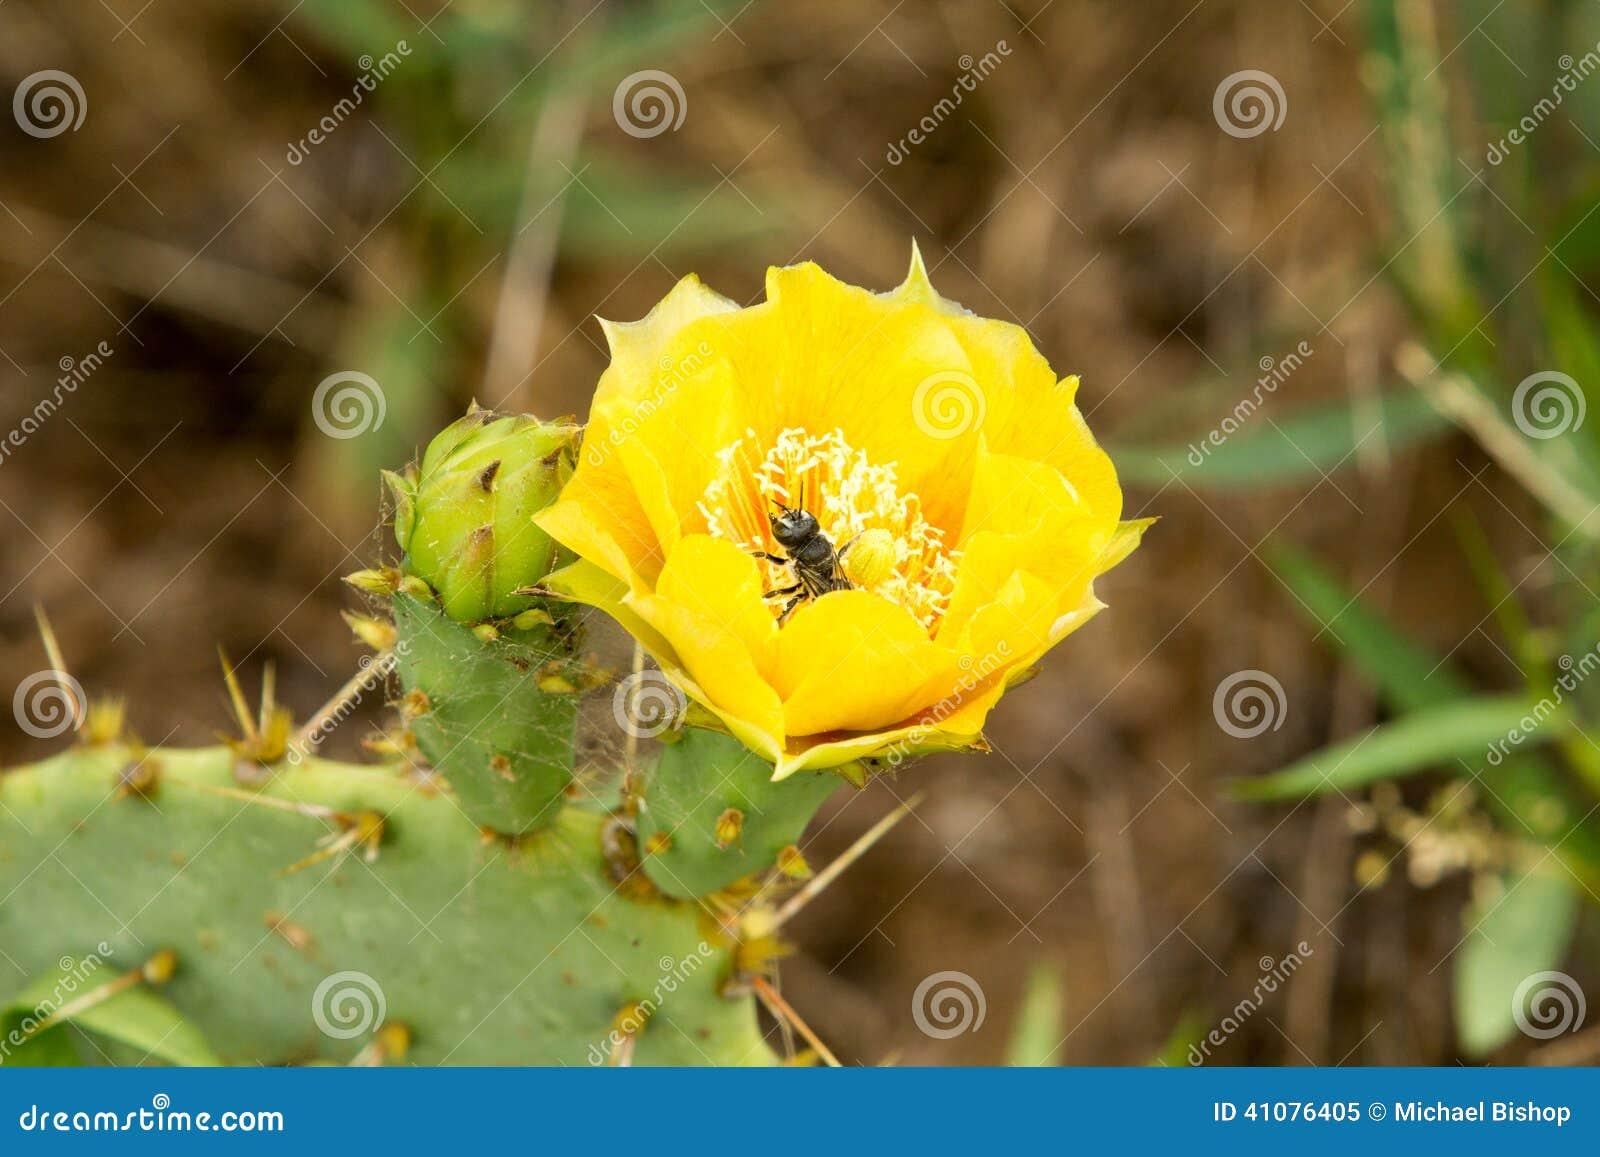 Kaktusfeige-Kaktus-Blume